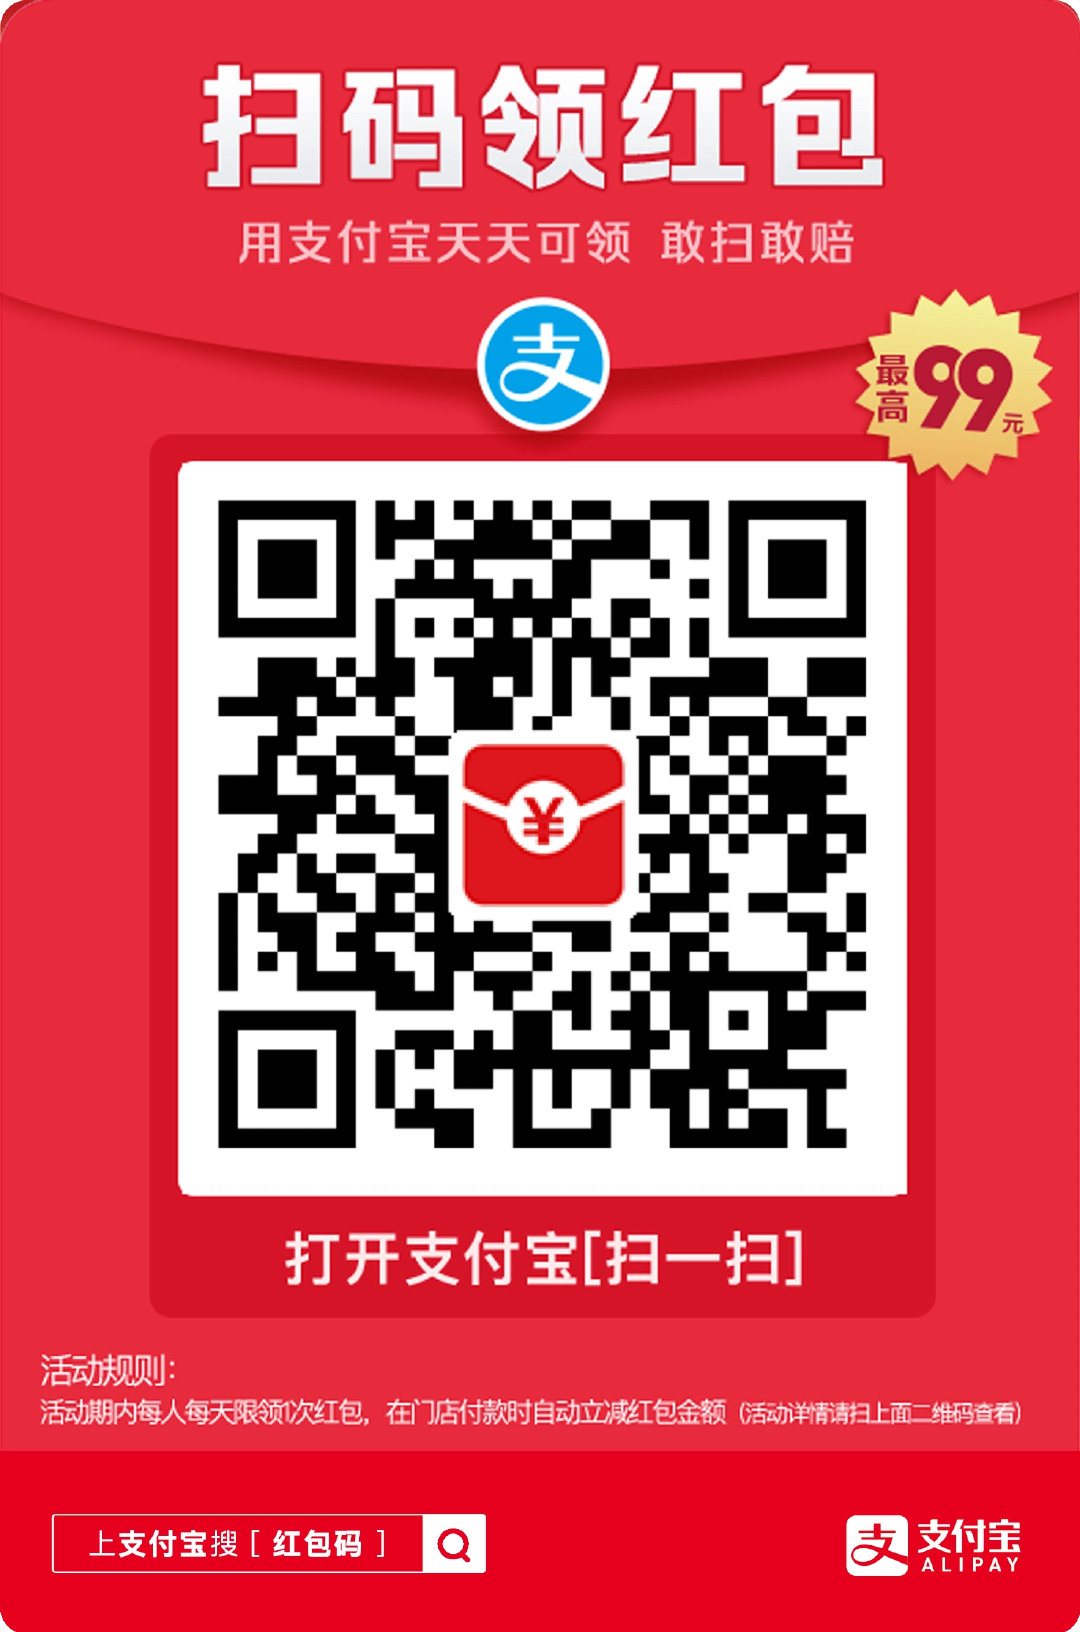 nur.cn之光苹果版